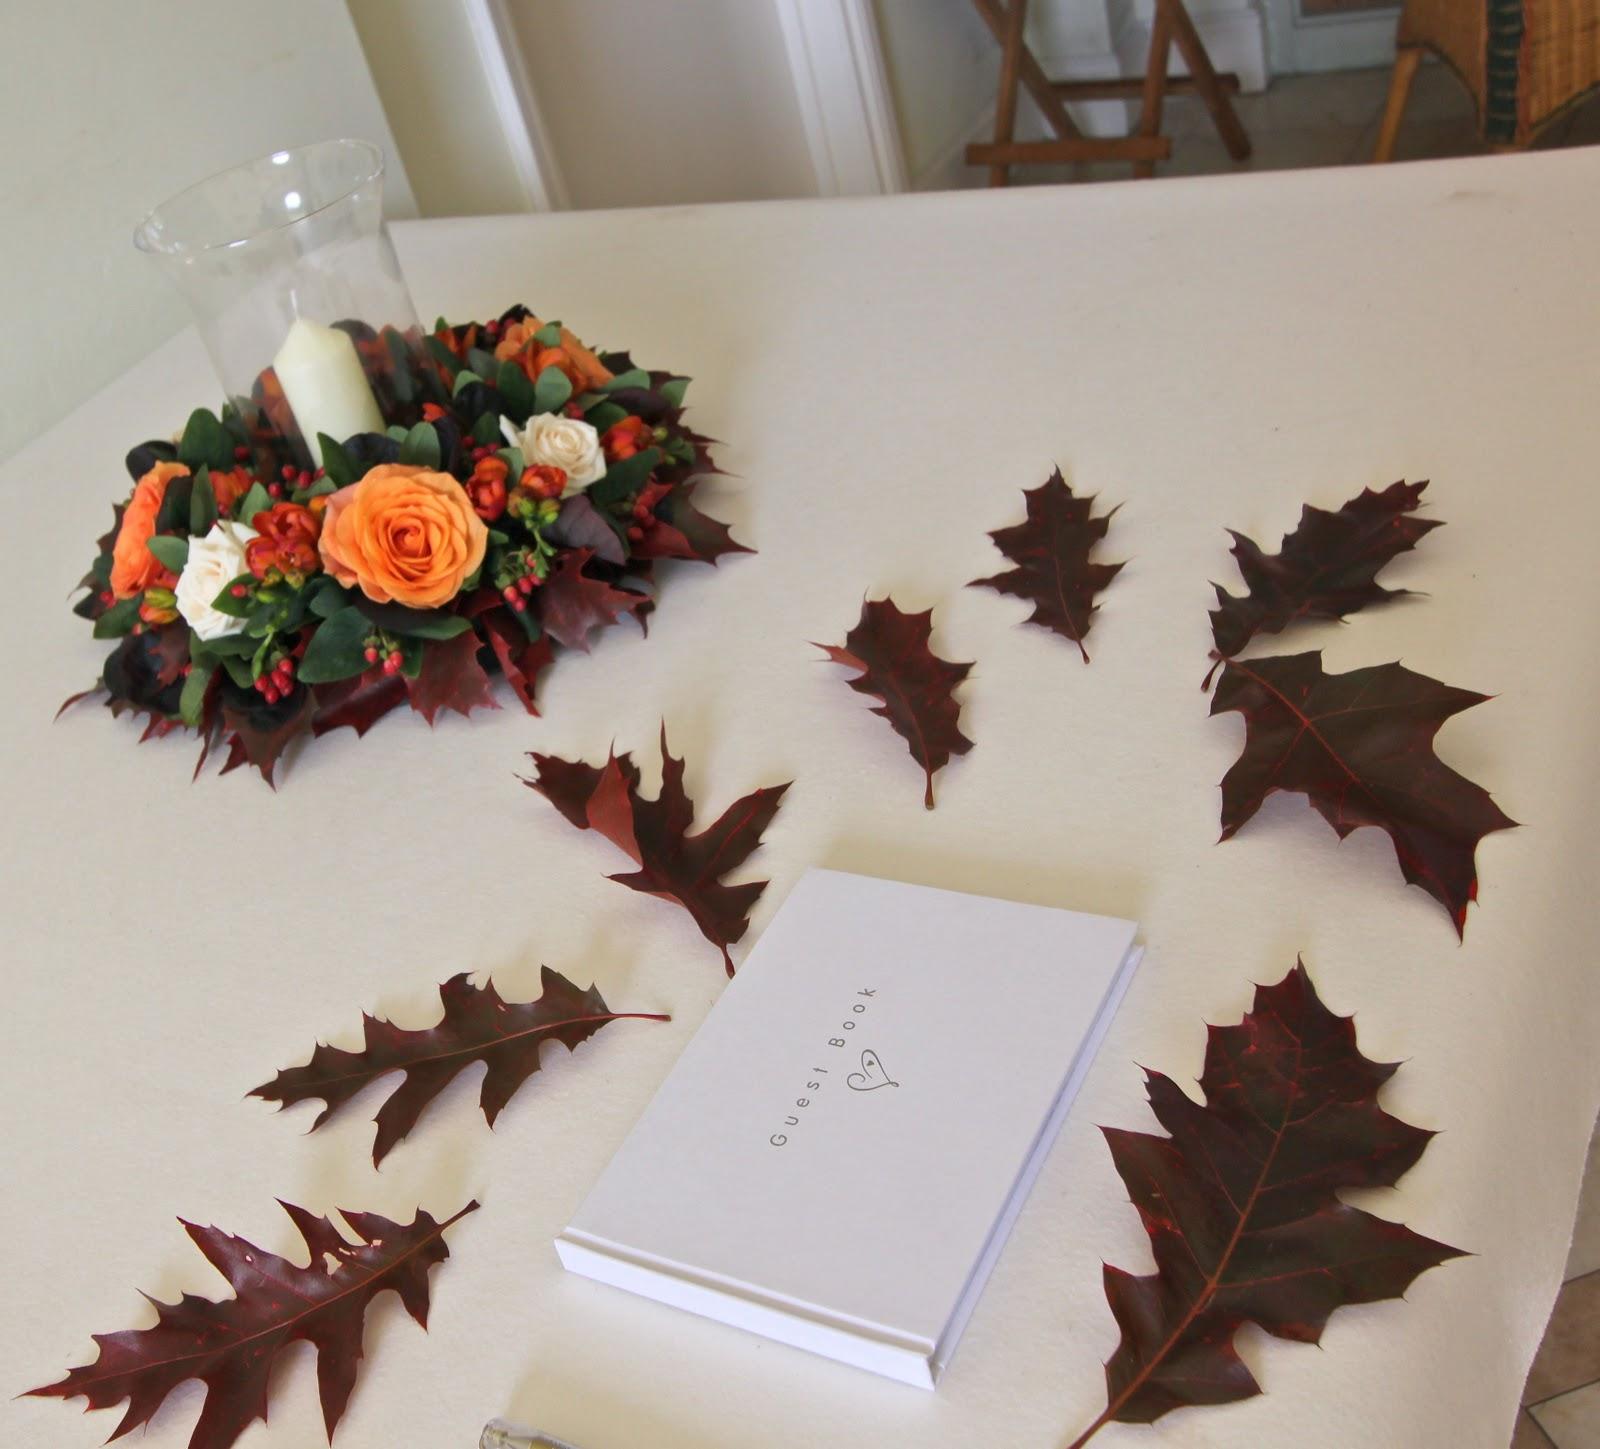 Continuing the autumn theme,